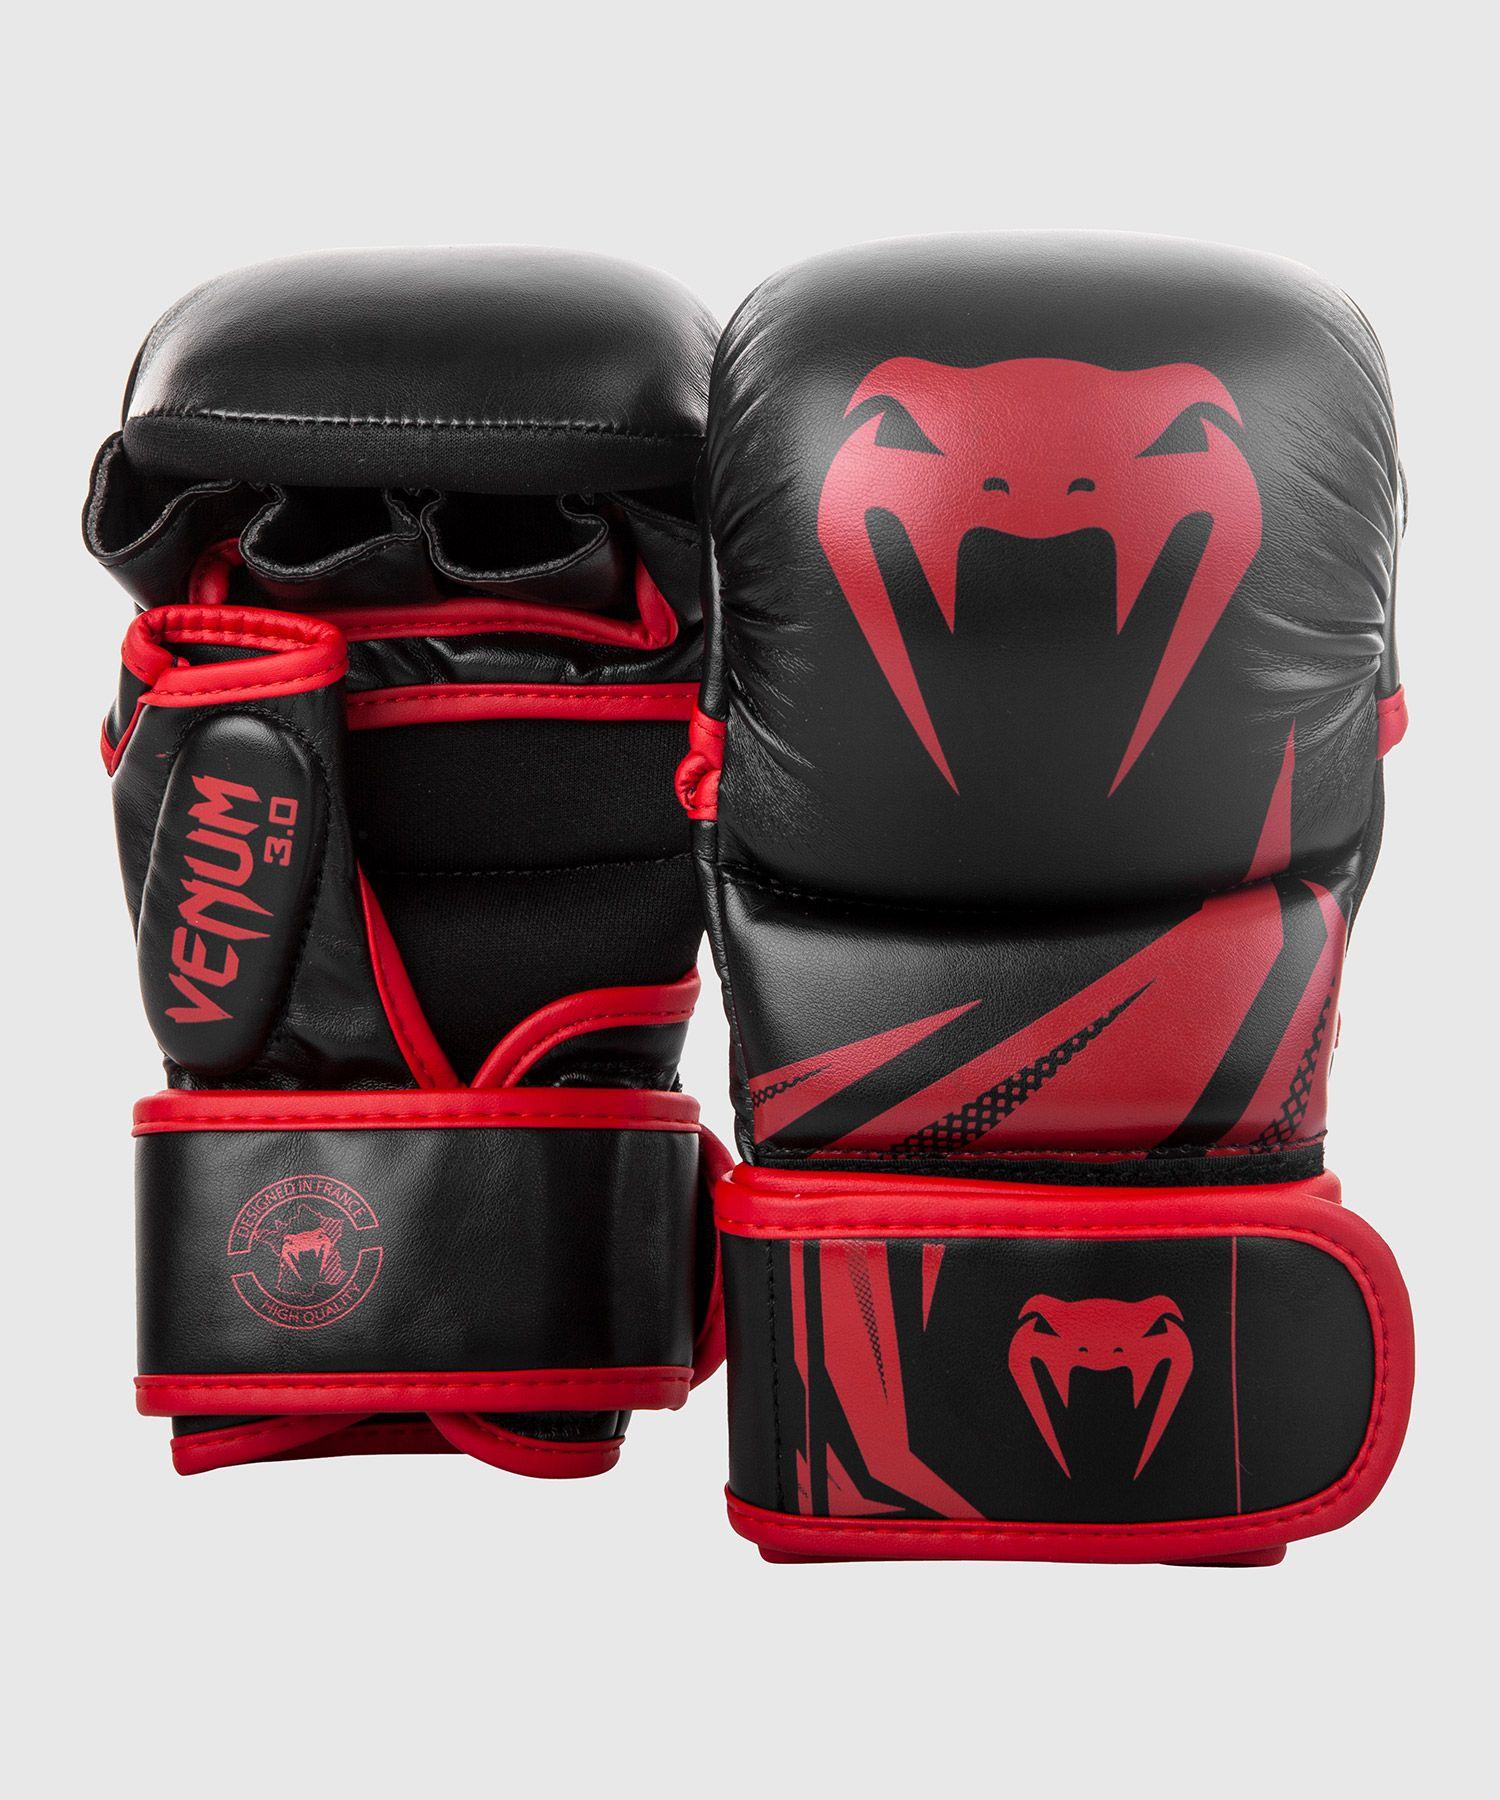 Venum Challenger 3.0 Trainingshandschoenen - Zwart/Rood